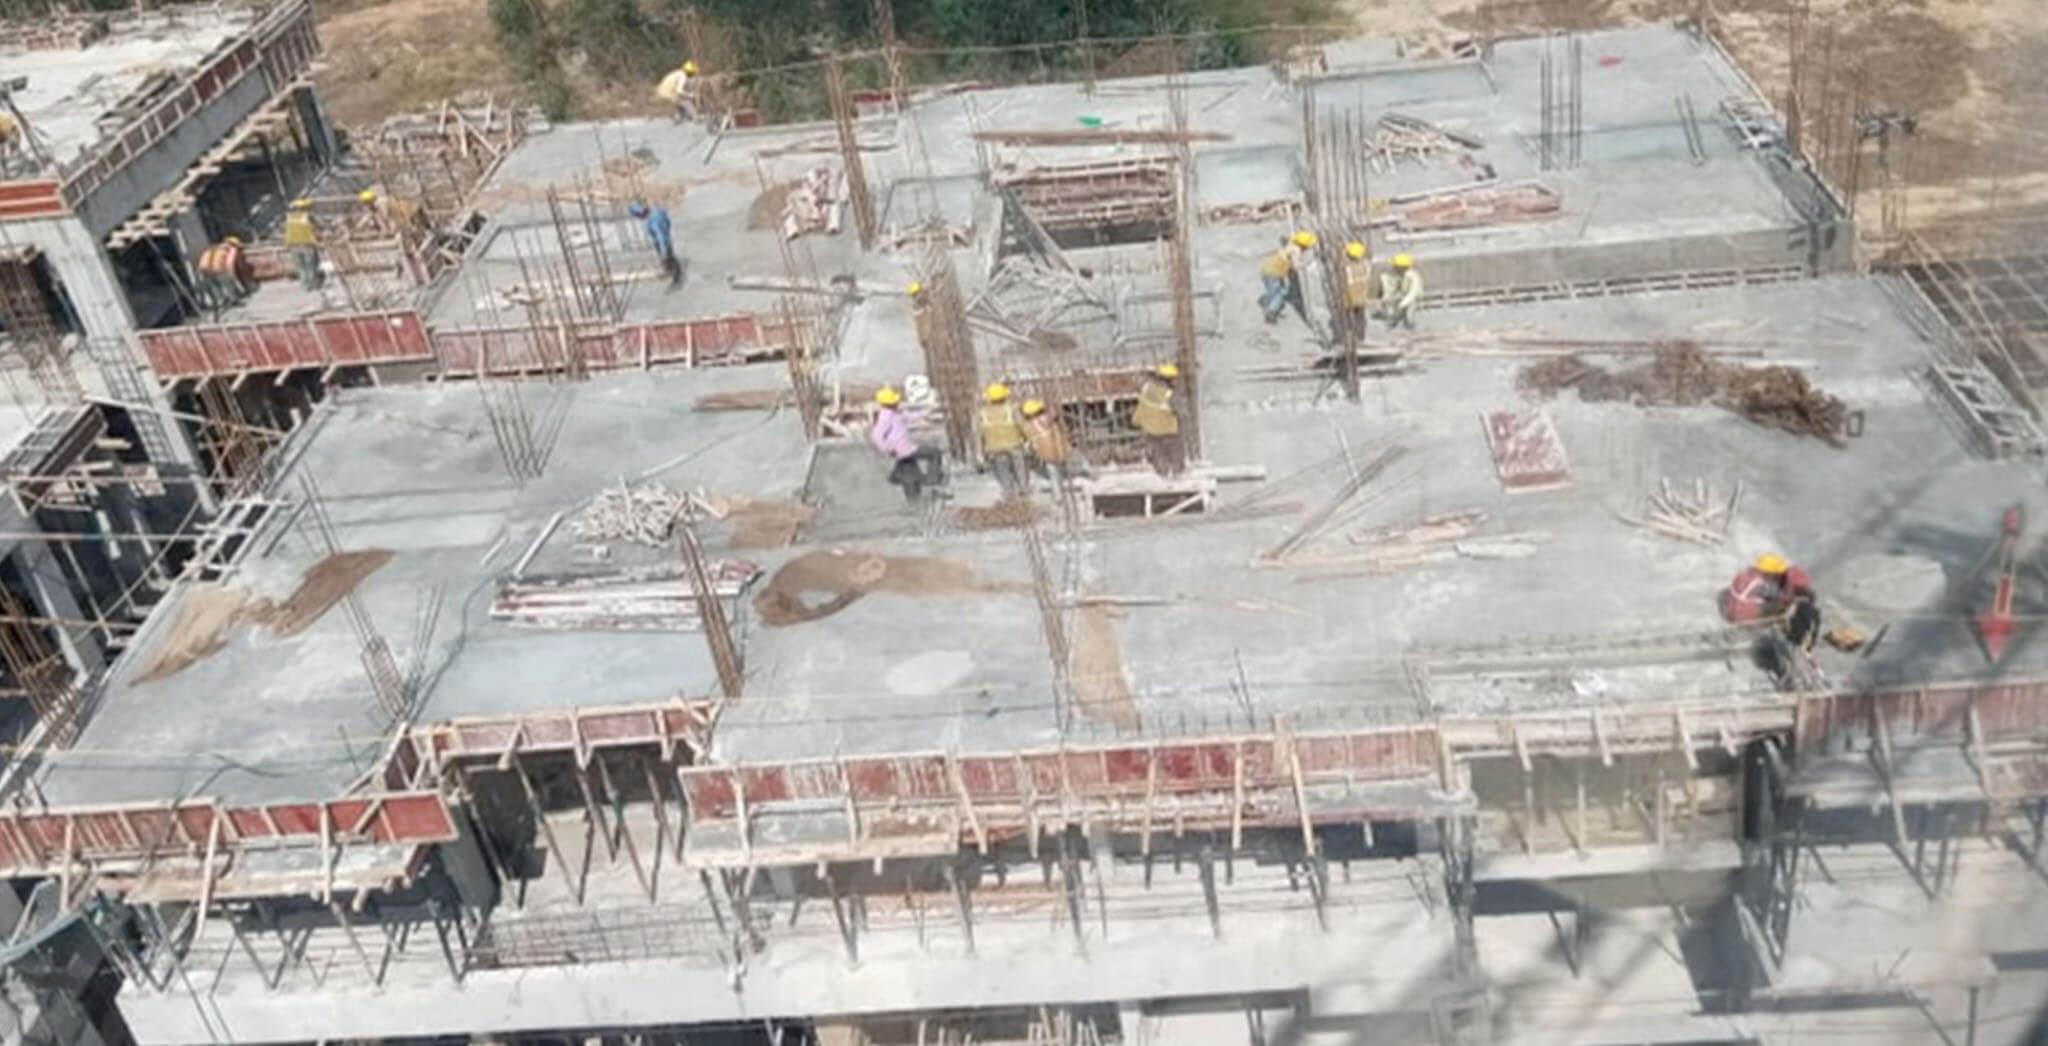 Jan 2020 - P Block: Fourth floor slab completed, 4th to terrace floor column rebar work-in-progress